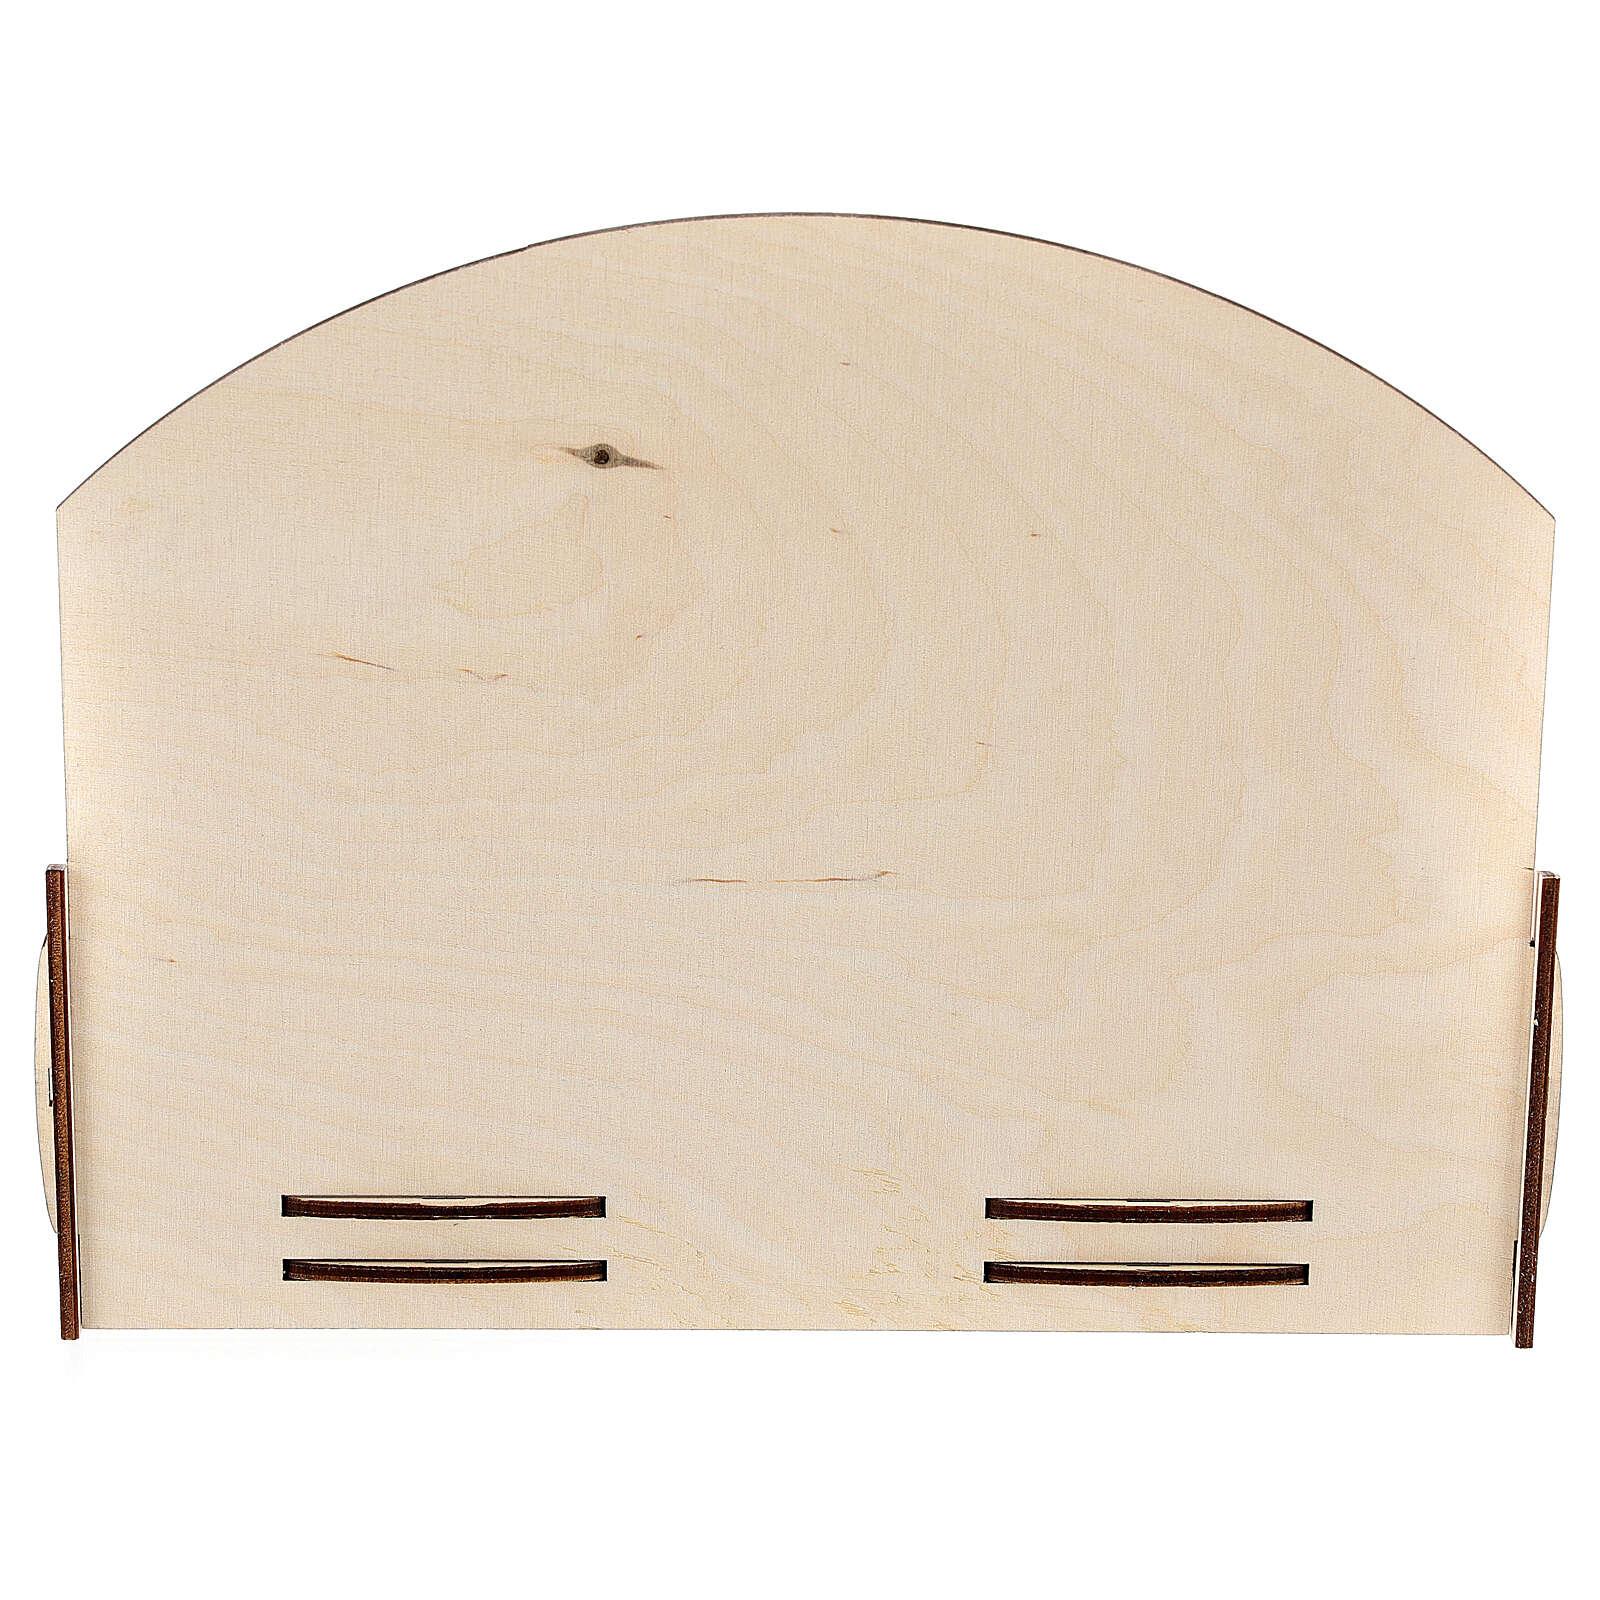 Espositore oli essenziali legno 18x22x23 cm 3